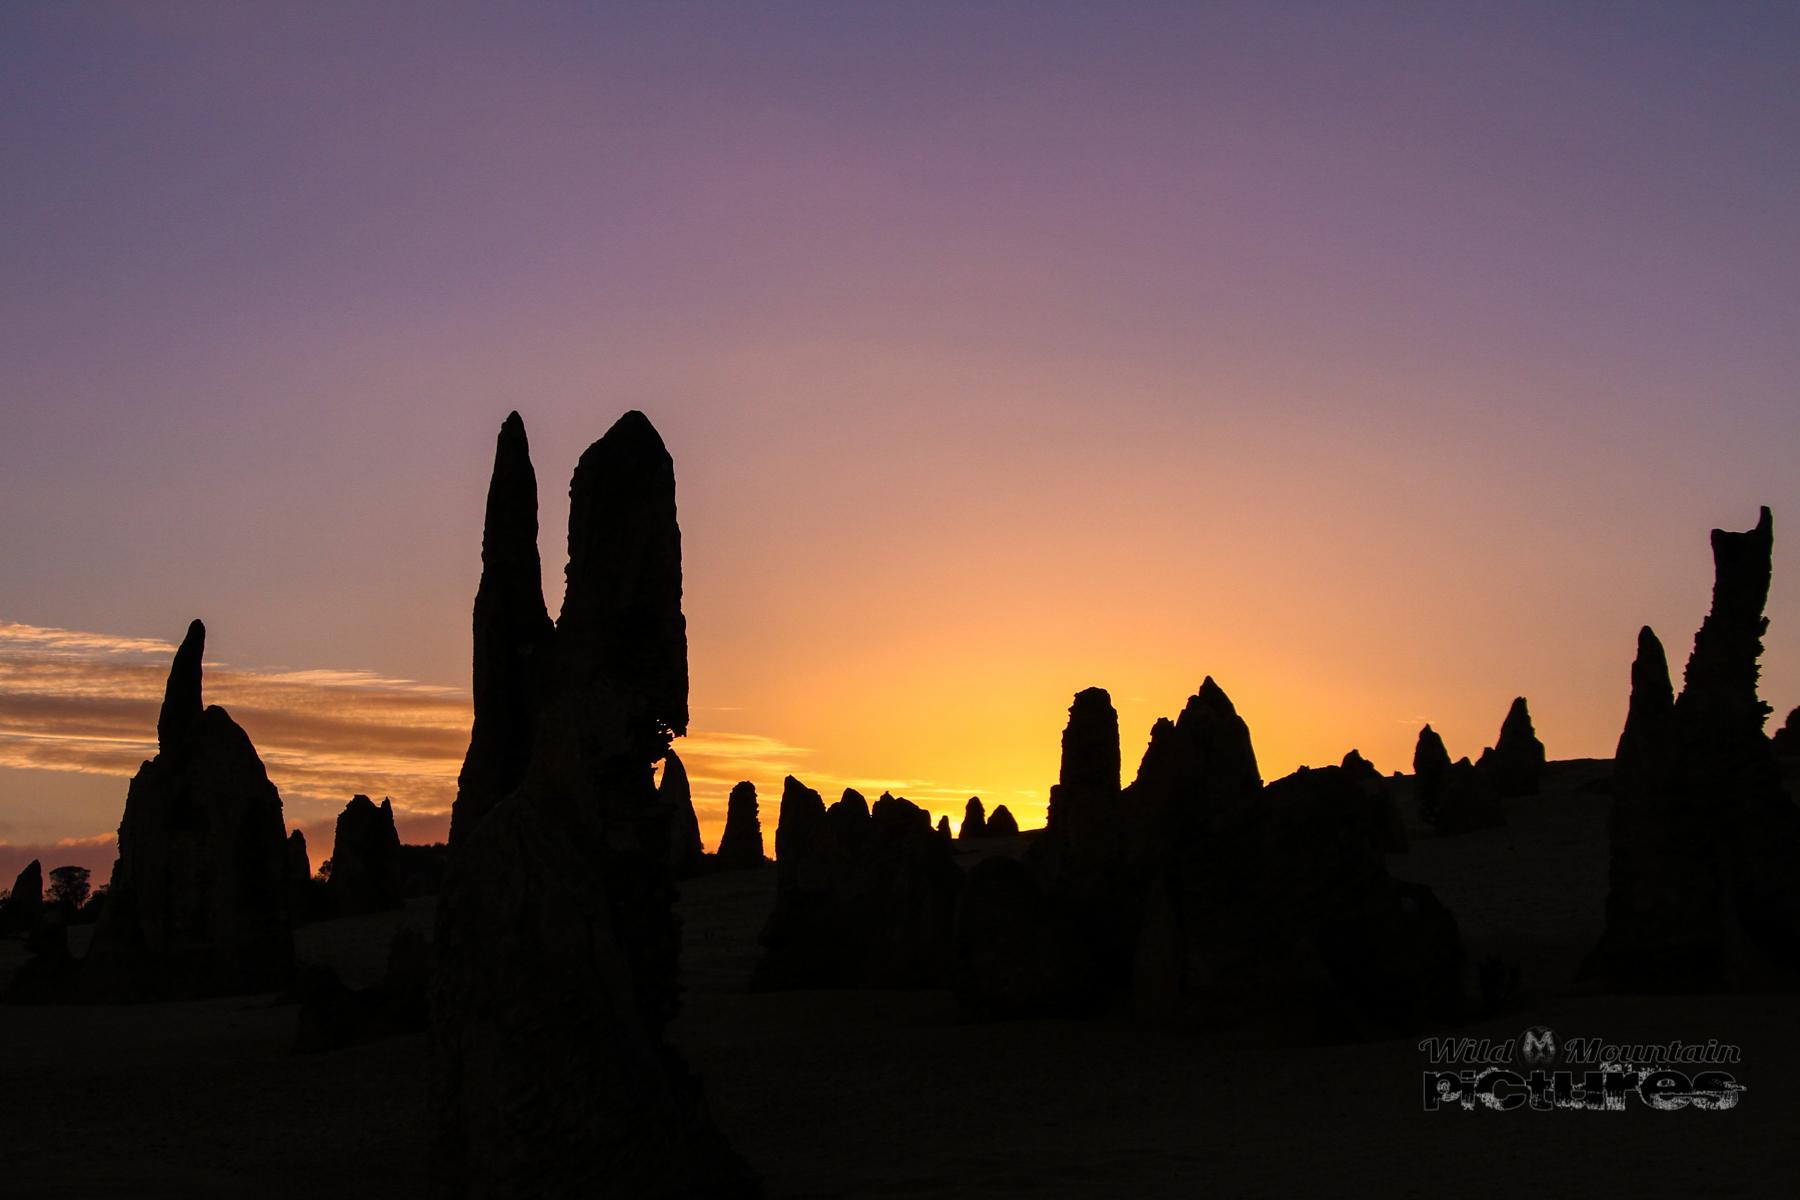 Sunrise In The Pinnacle Desert